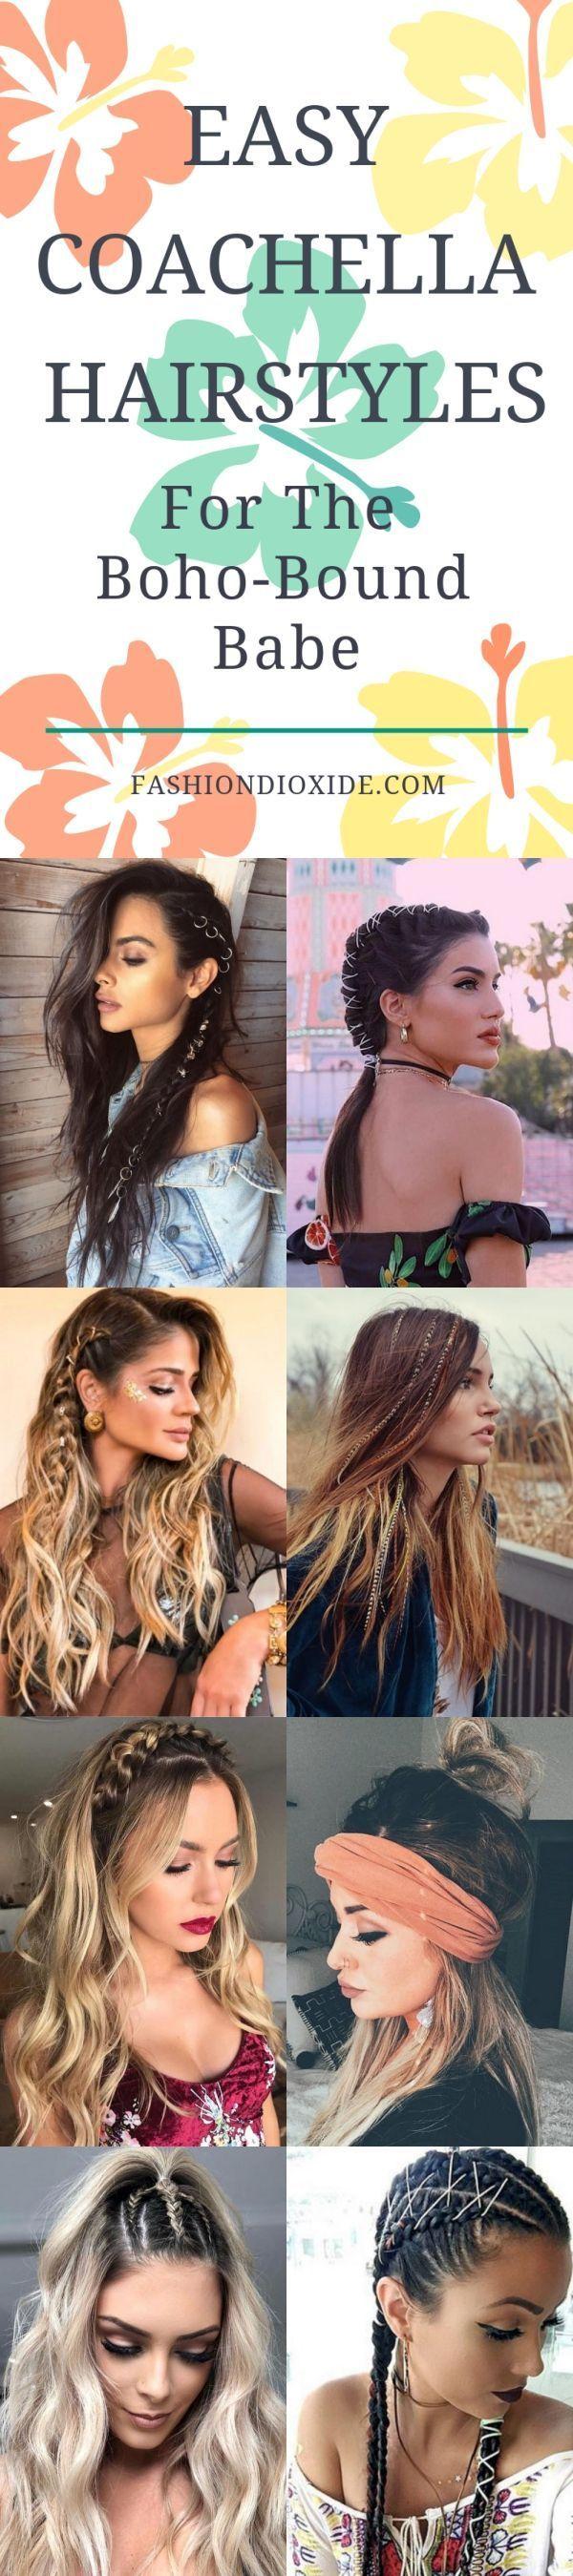 40 easy coachella hairstyles for the boho-bound babe #certain #coachella #easy #clothes #diy-hairstyles